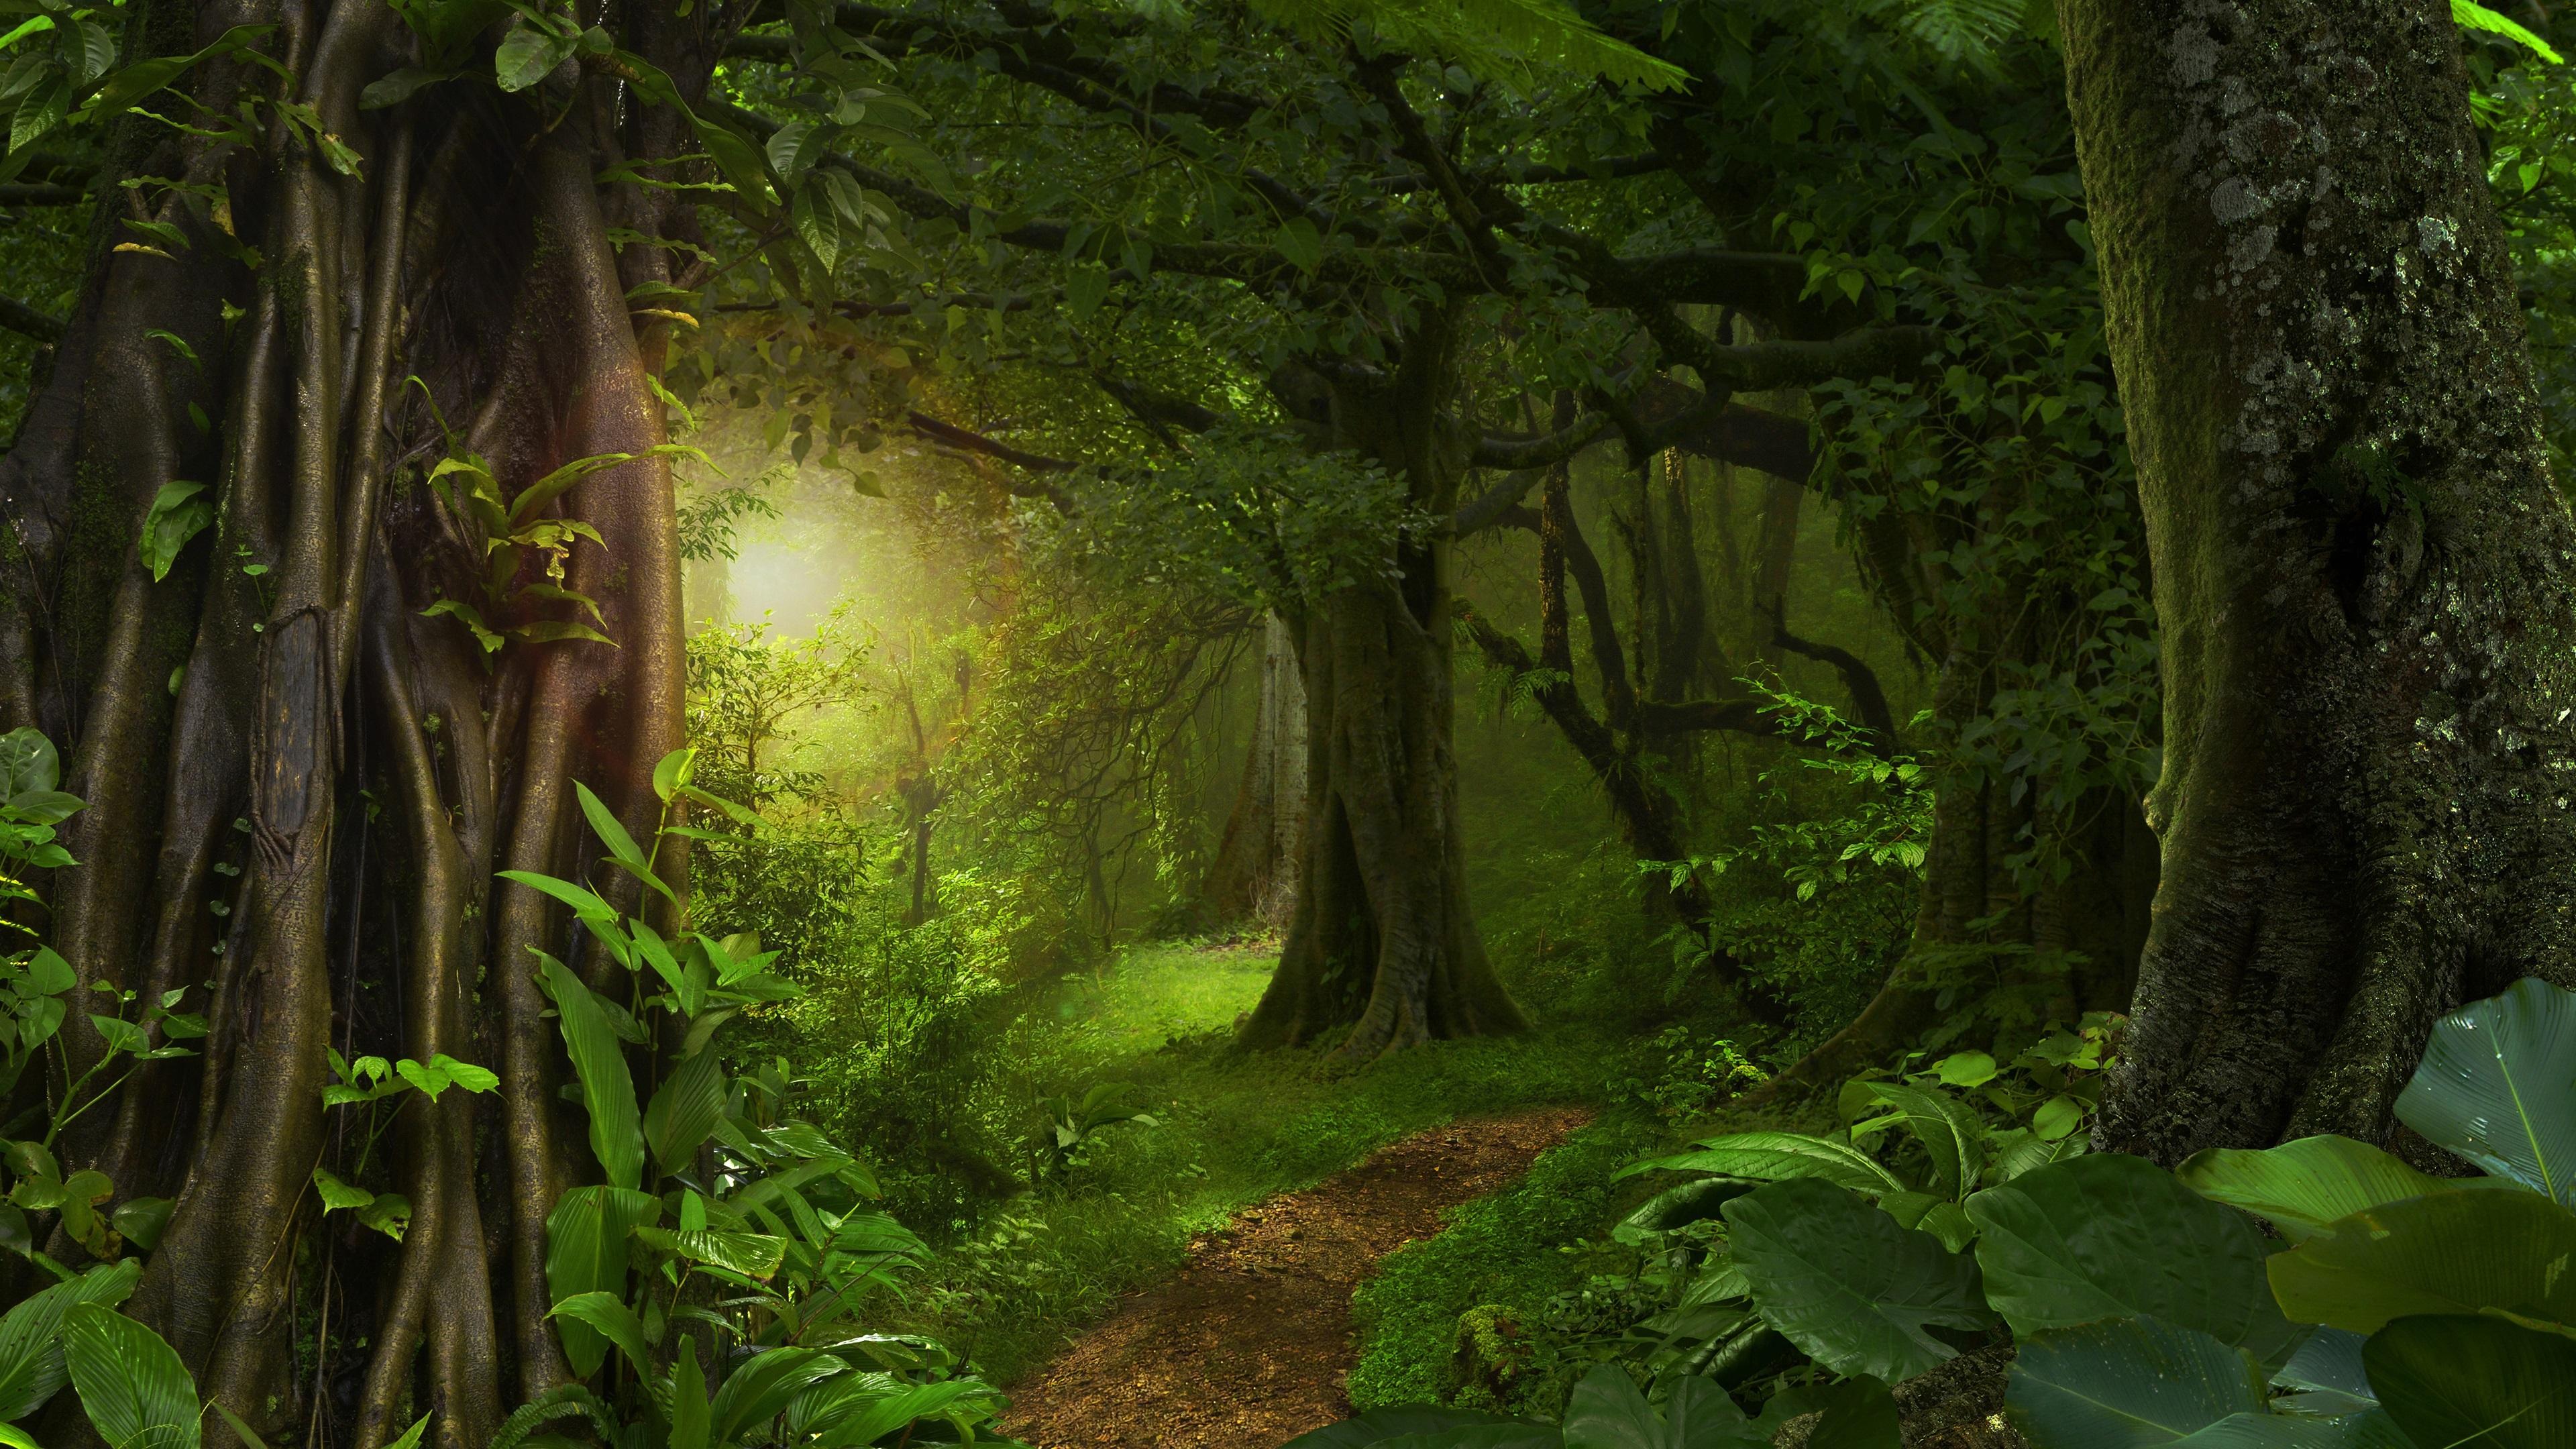 Wallpaper Forest, jungle, trees, path, green 3840x2160 UHD ...